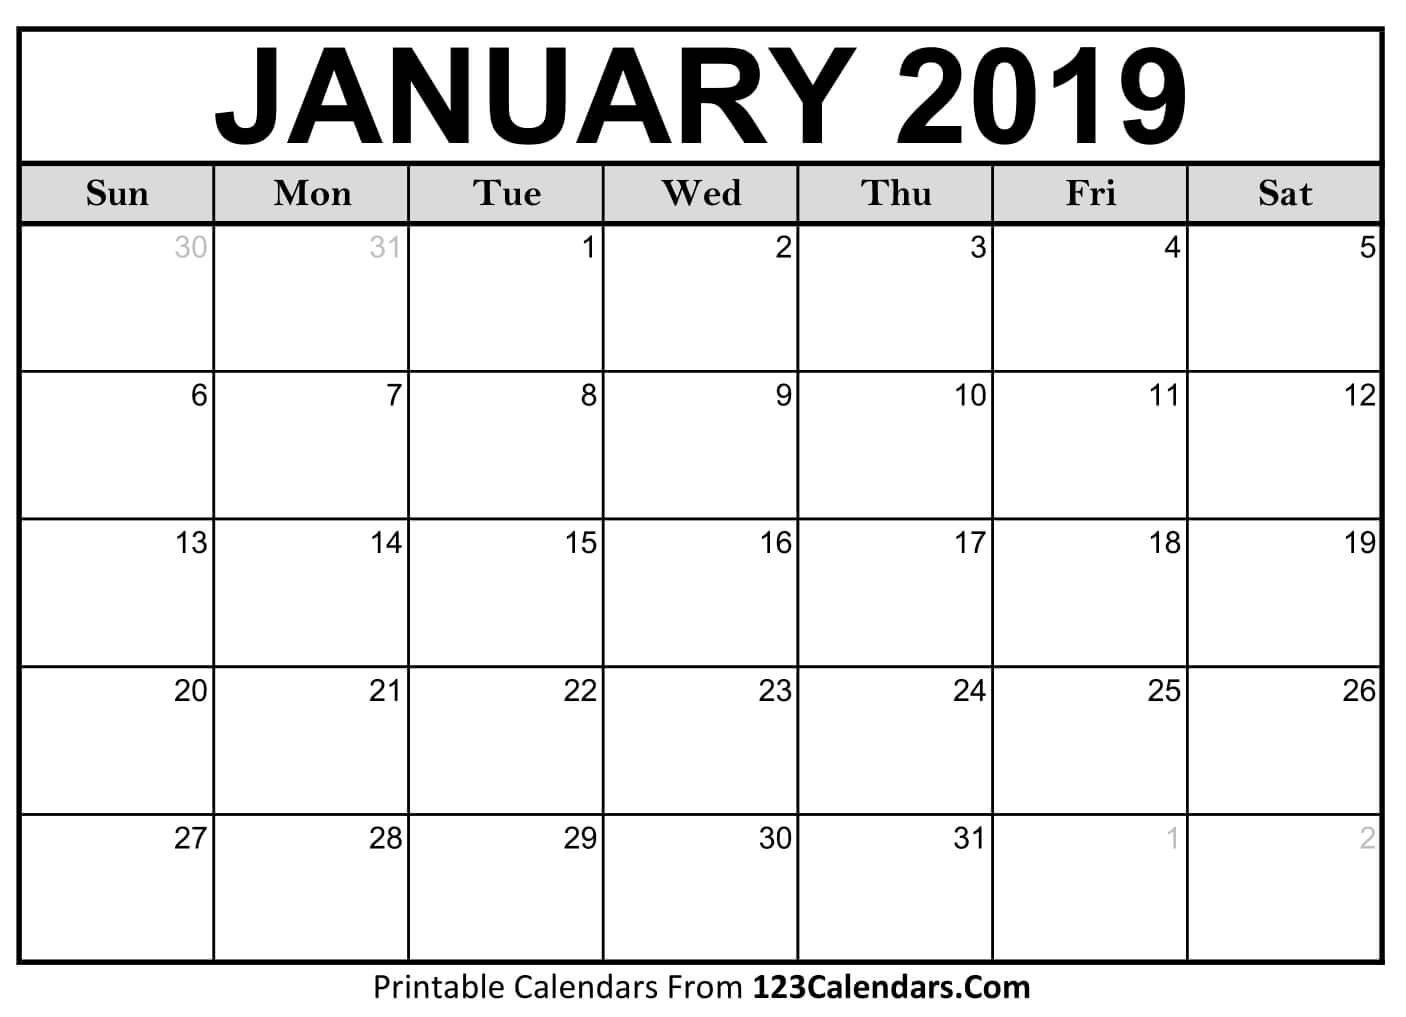 Printable January 2019 Calendar Templates – 123Calendars 2019 Calendar 1 Sheet